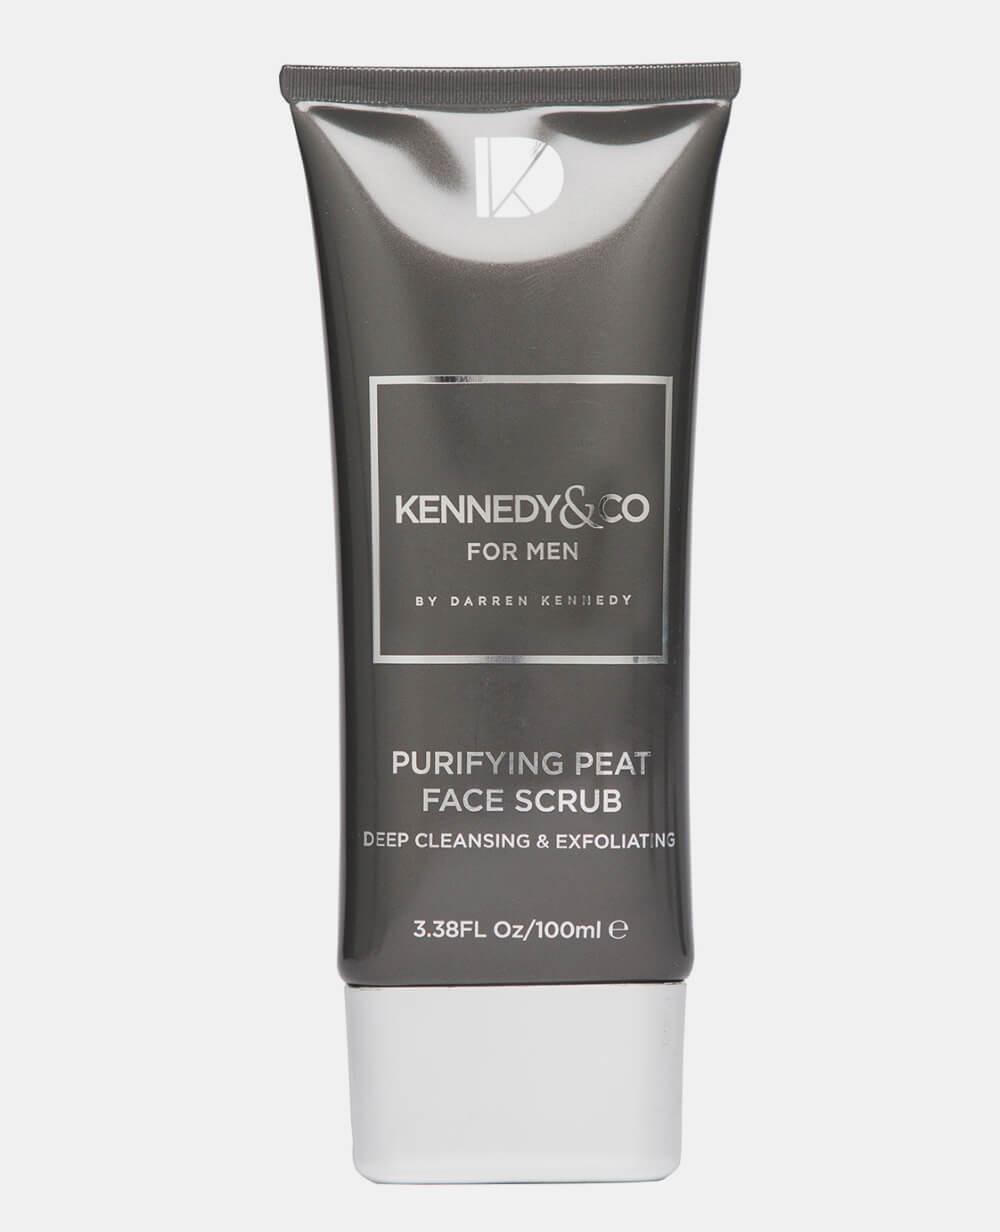 Kennedy & Co Purifying Peat Face Scrub 100ml